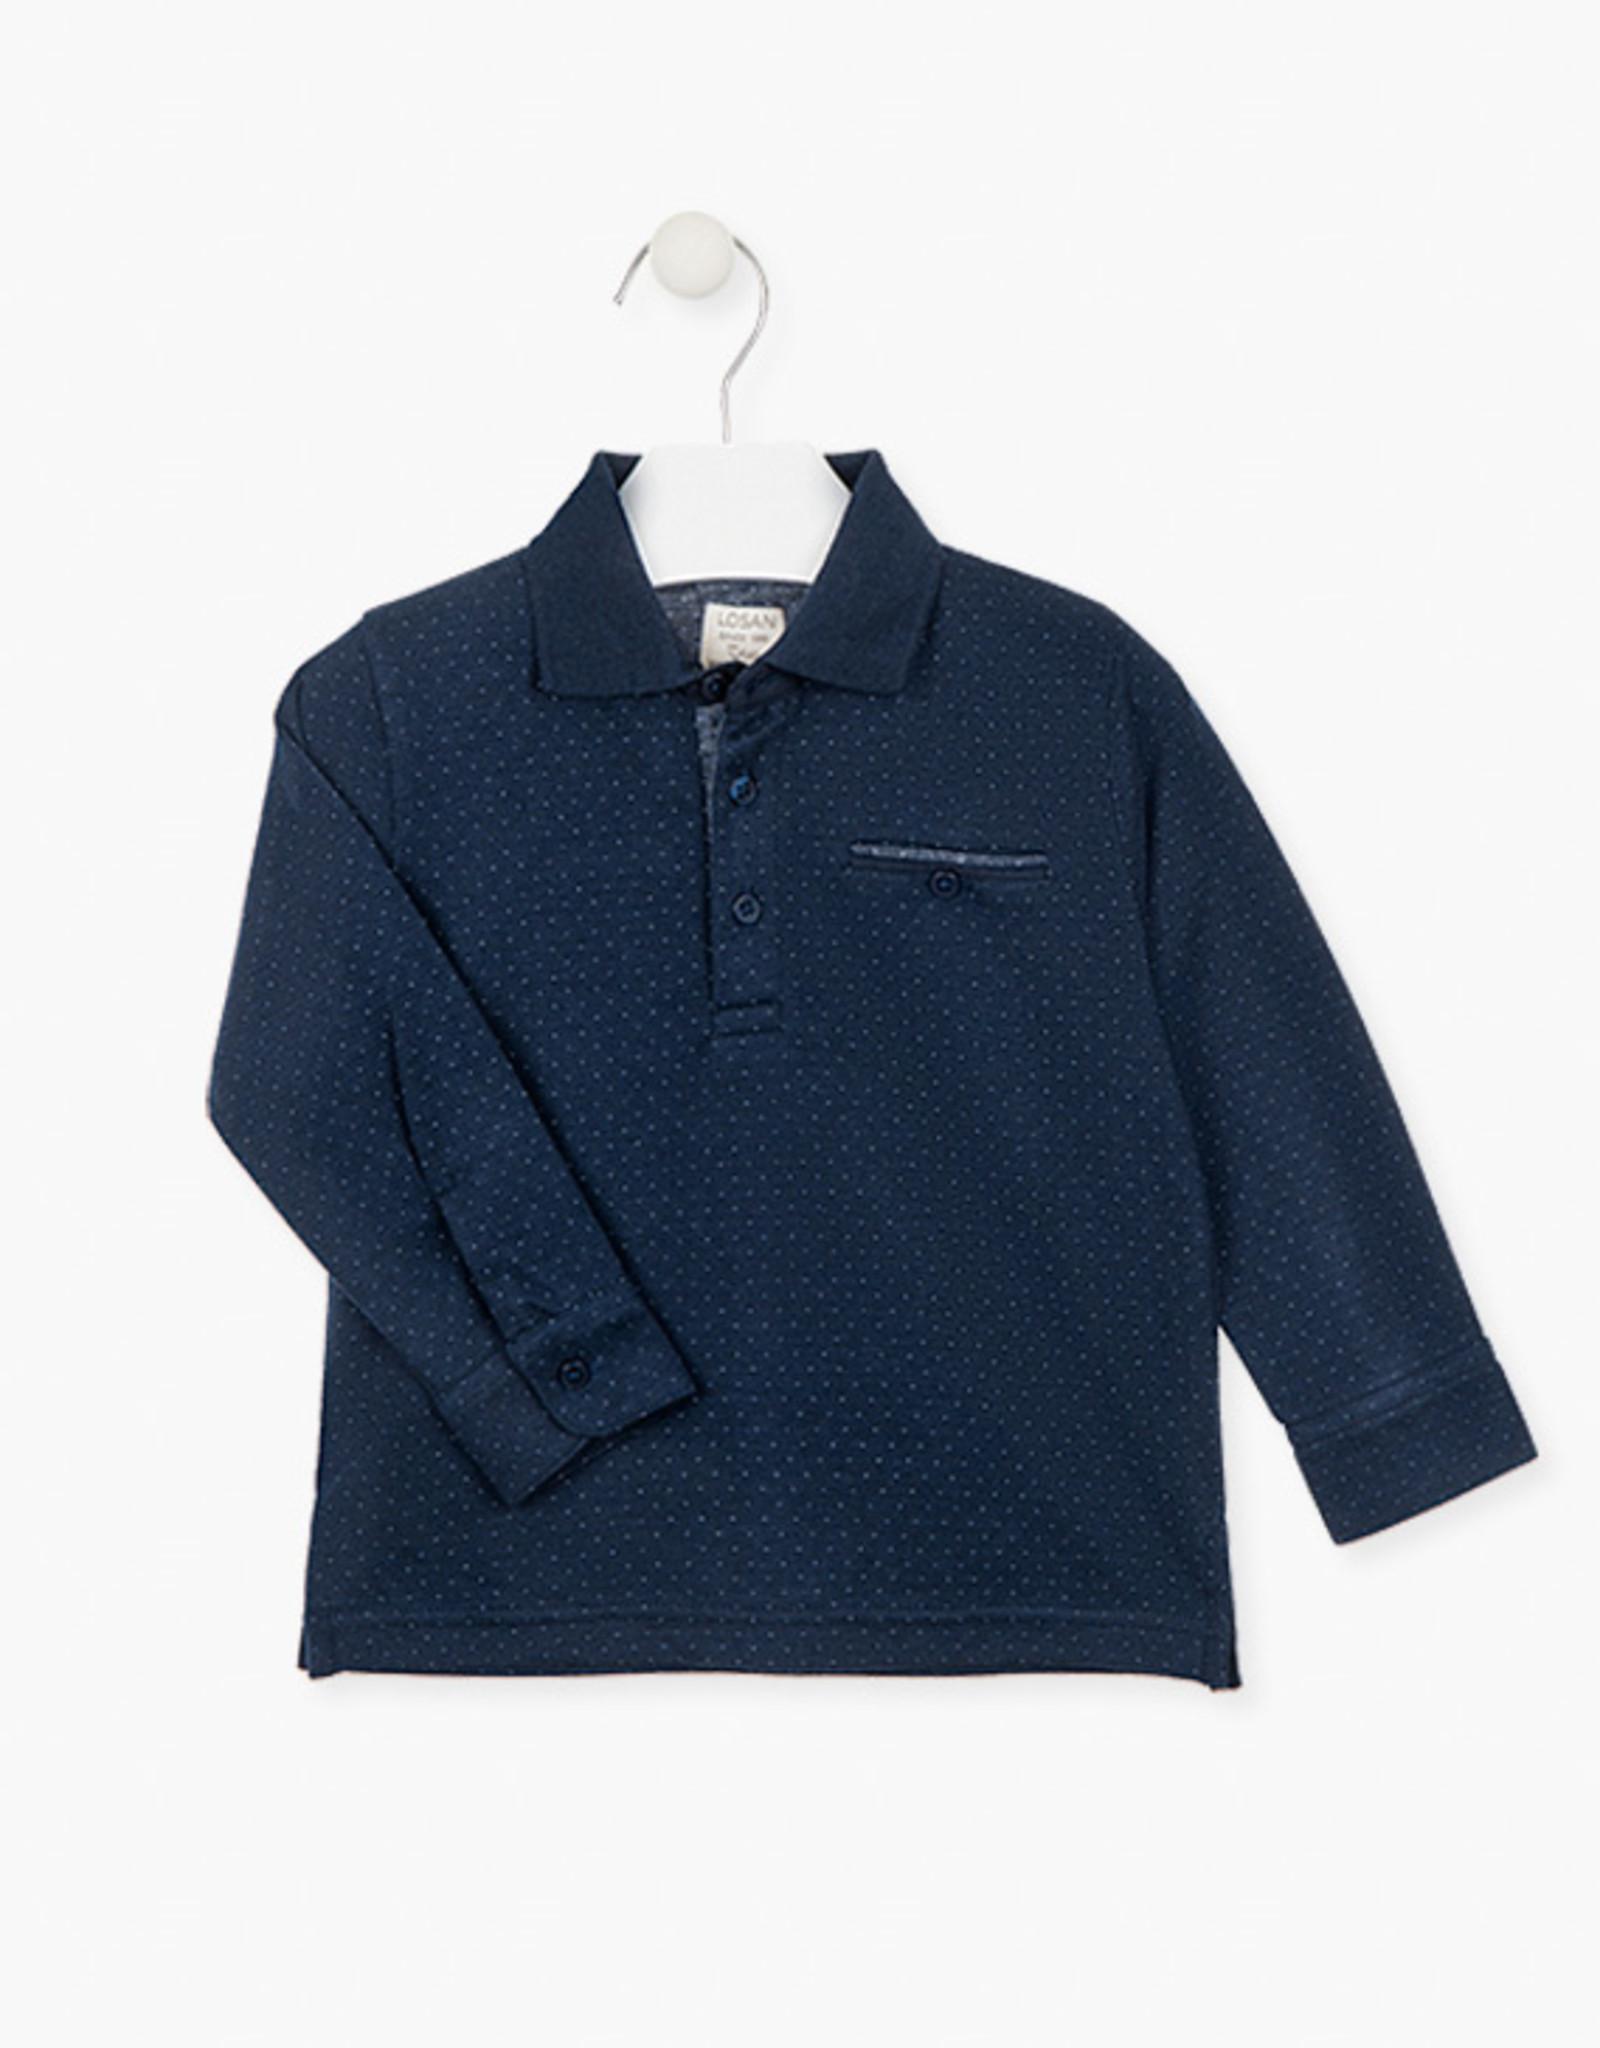 Losan FA20 Boys Long Sleeve Navy Polo